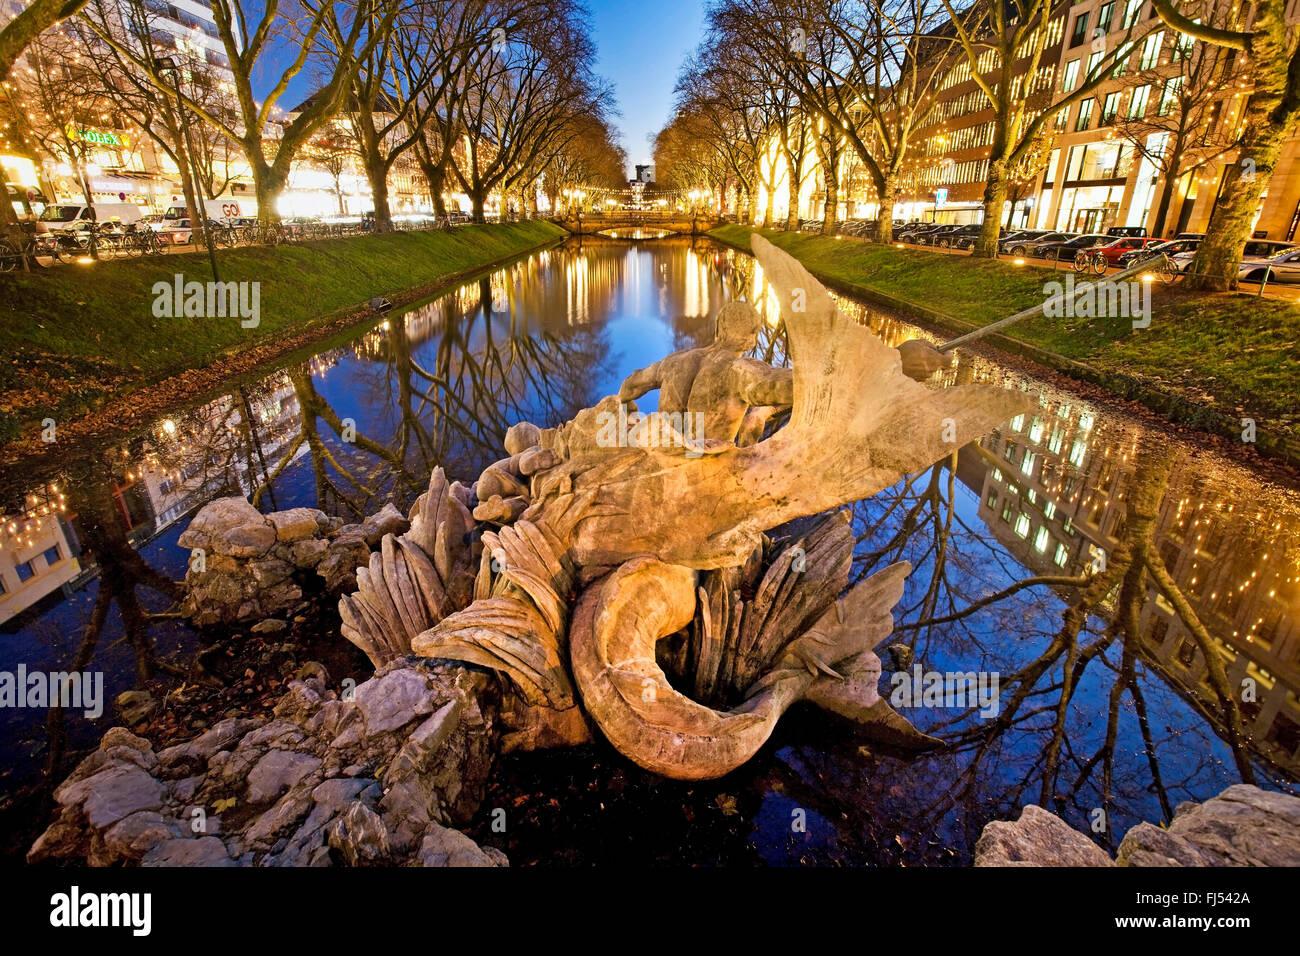 Triton Fountain of Koenigsallee, Germany, North Rhine-Westphalia, Duesseldorf Stock Photo